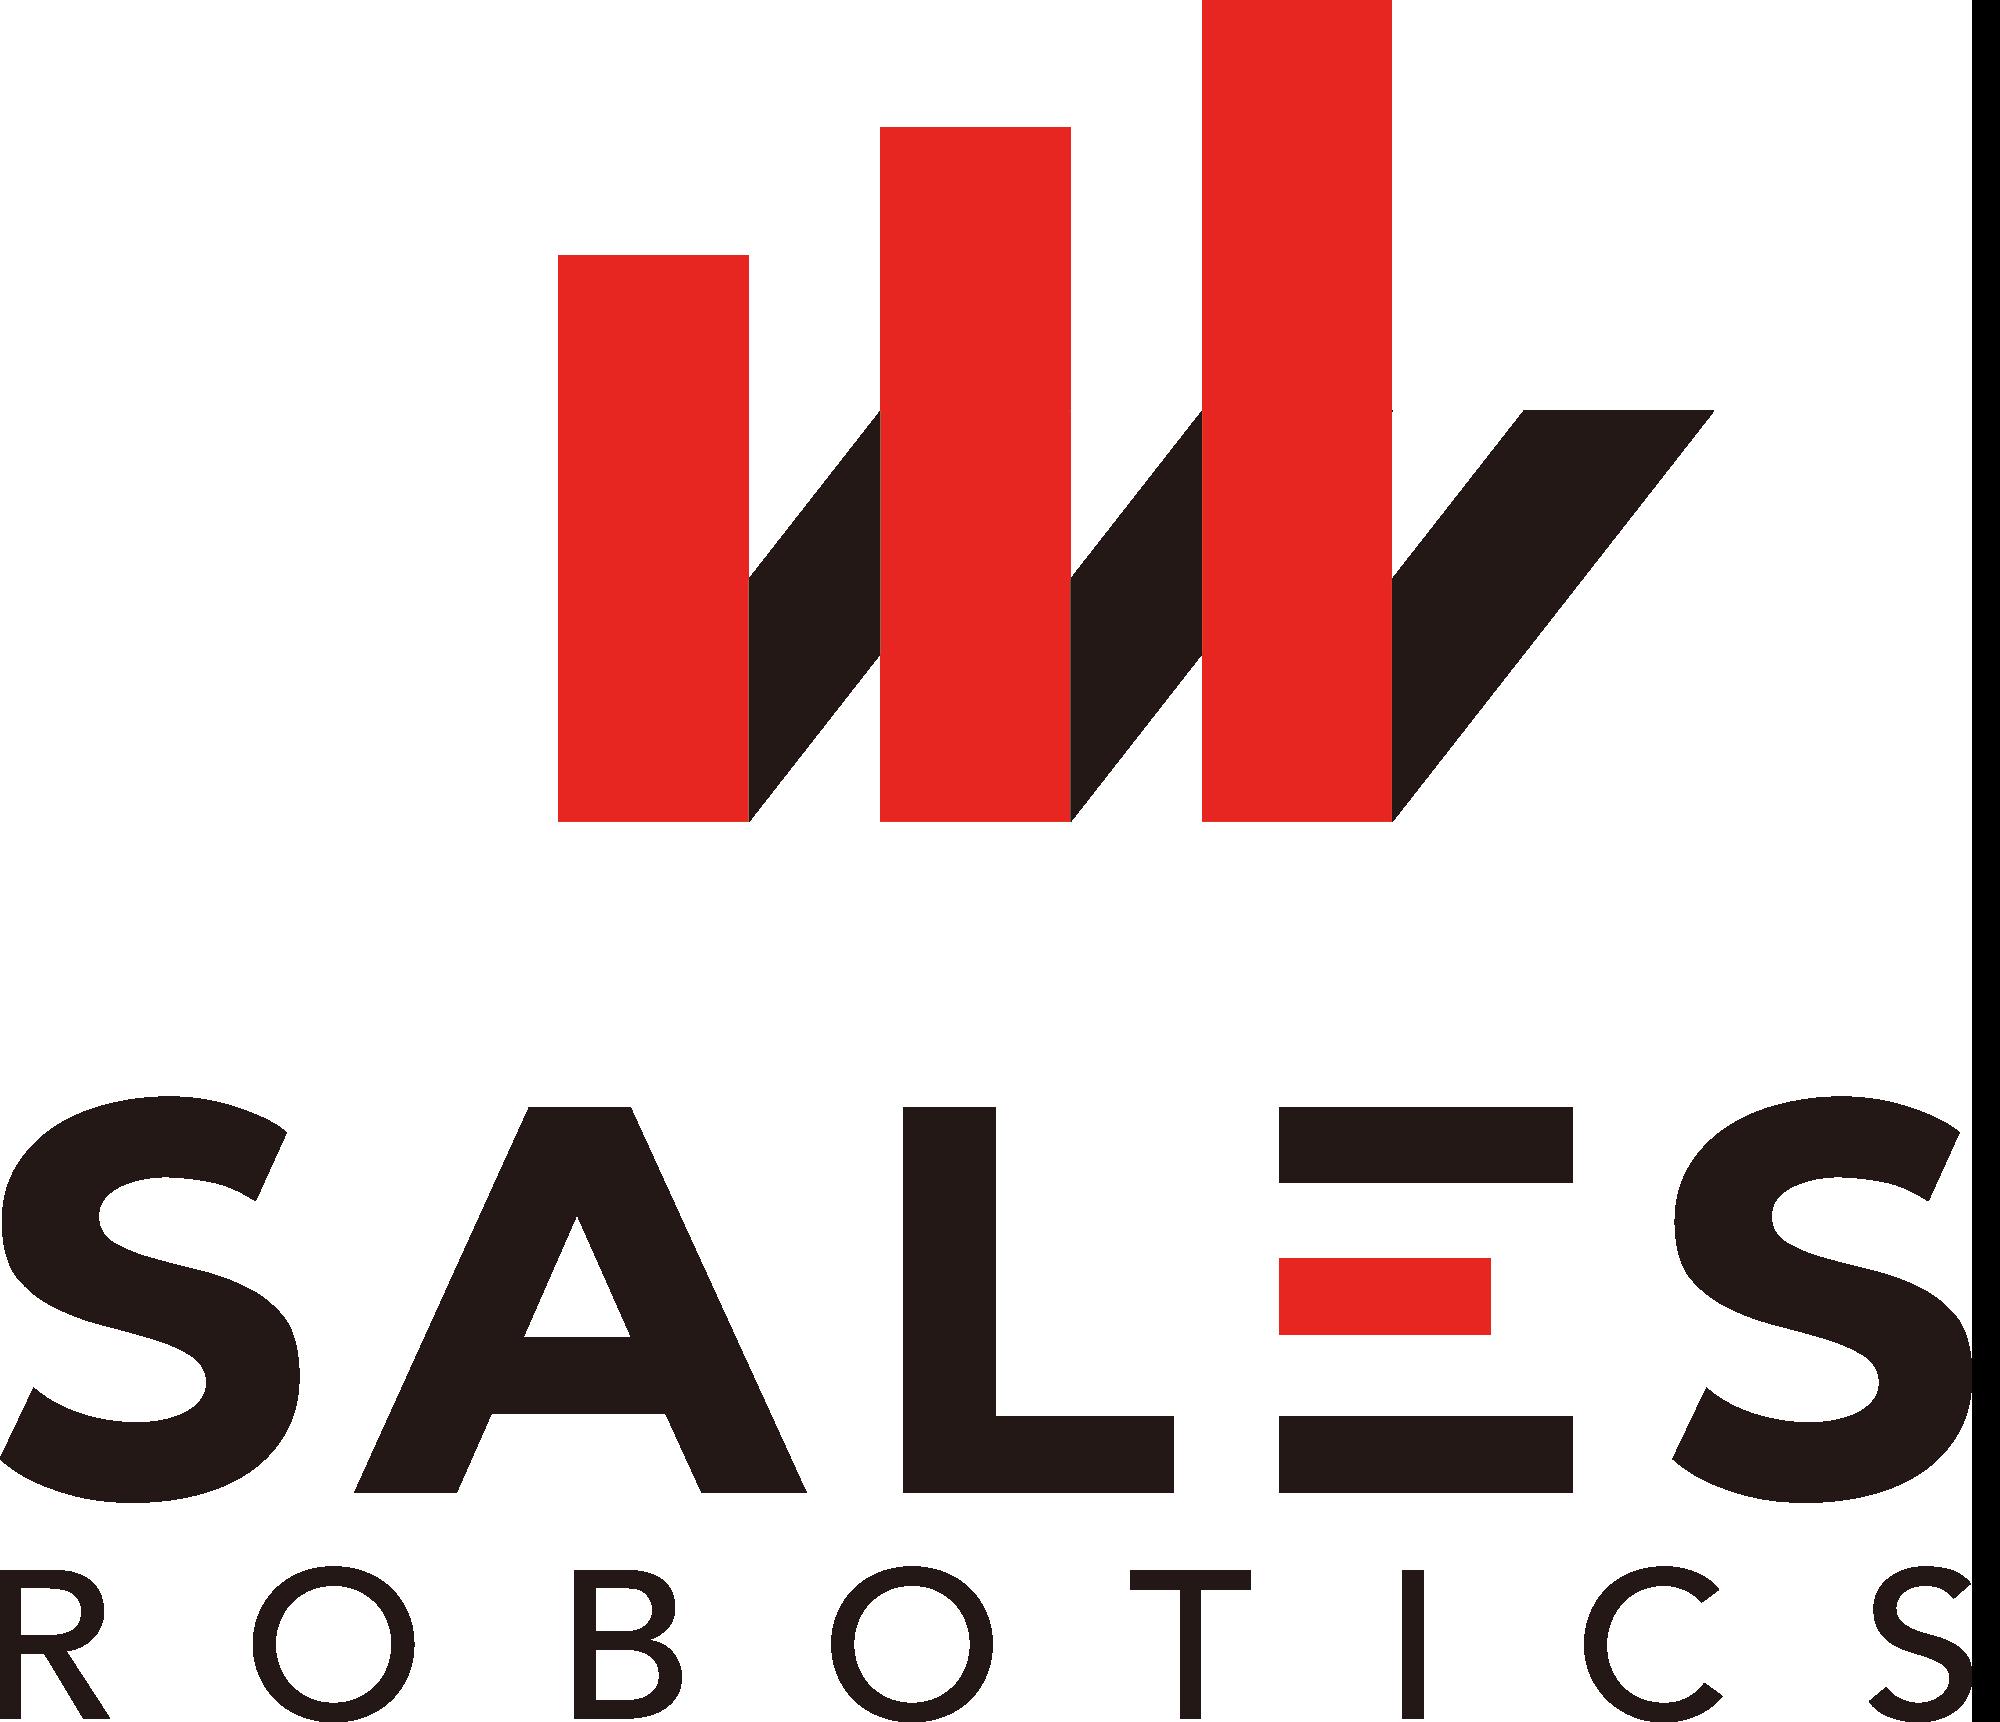 SALES ROBOTICS株式会社(旧:株式会社WEIC)